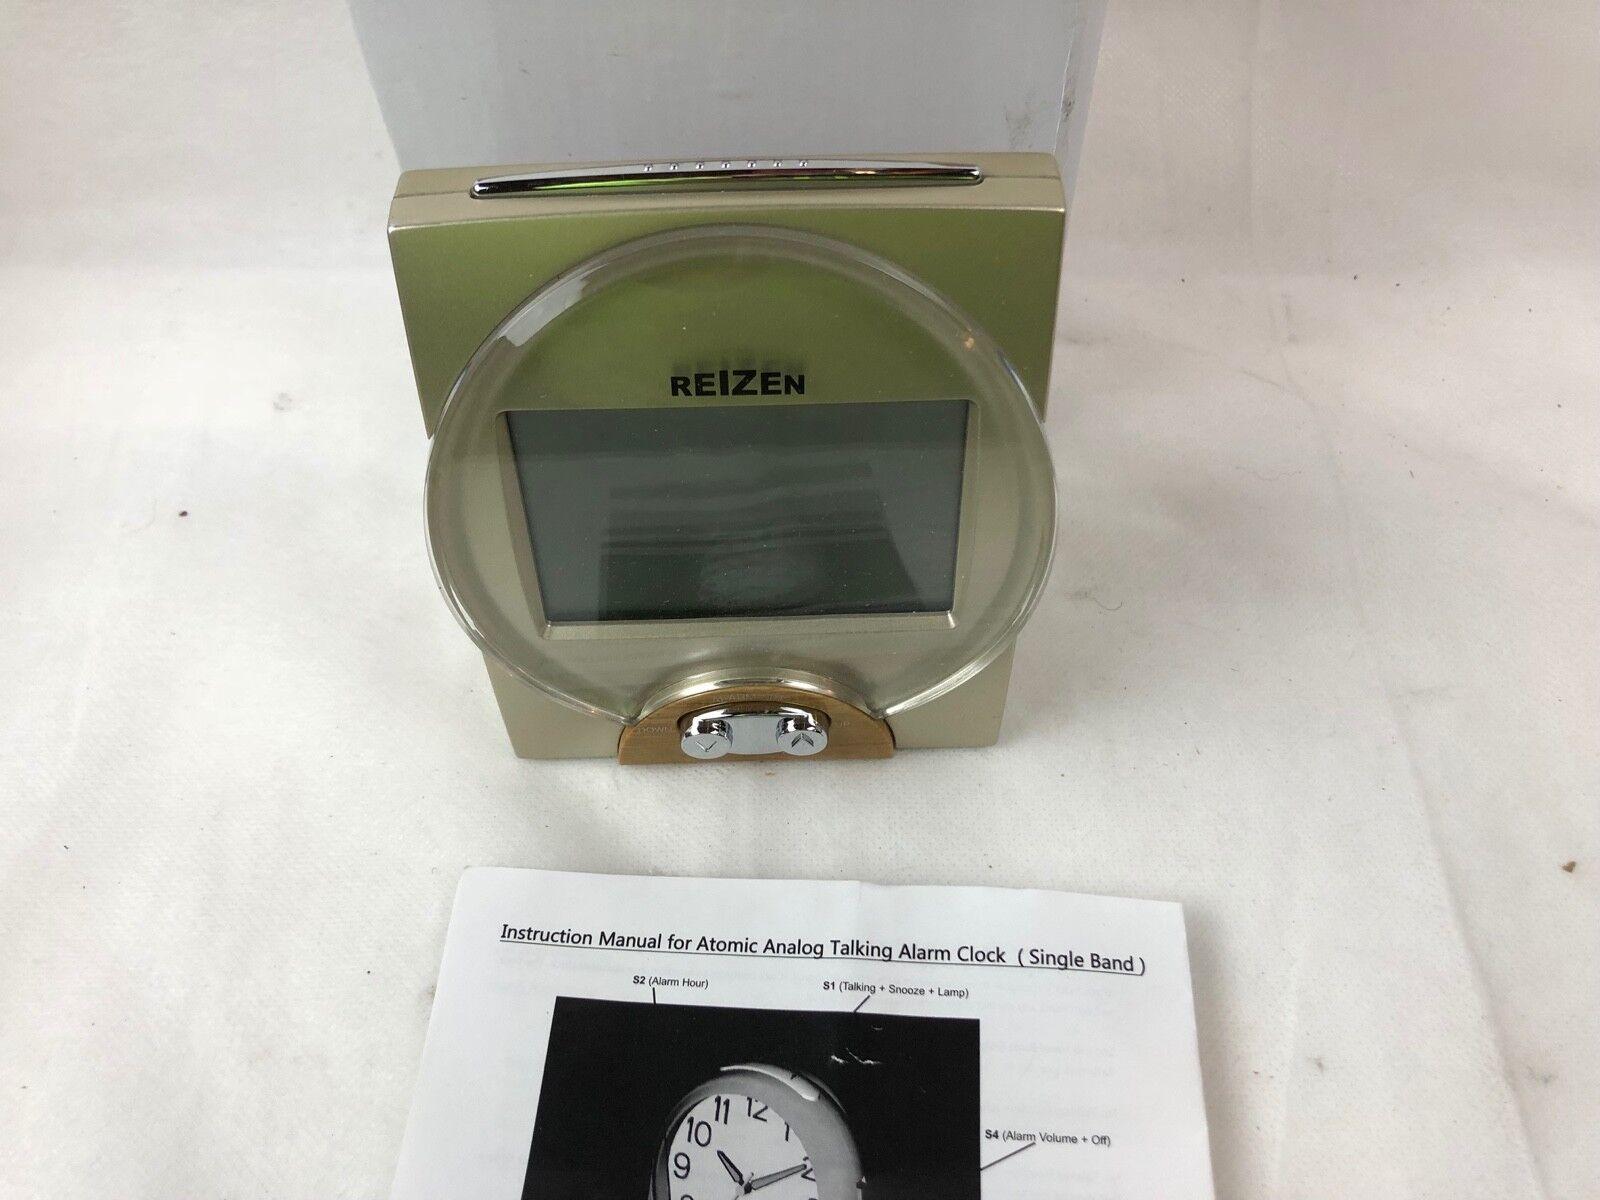 REIZEN Talking Atomic Alarm Clock Battery Operated New in Box